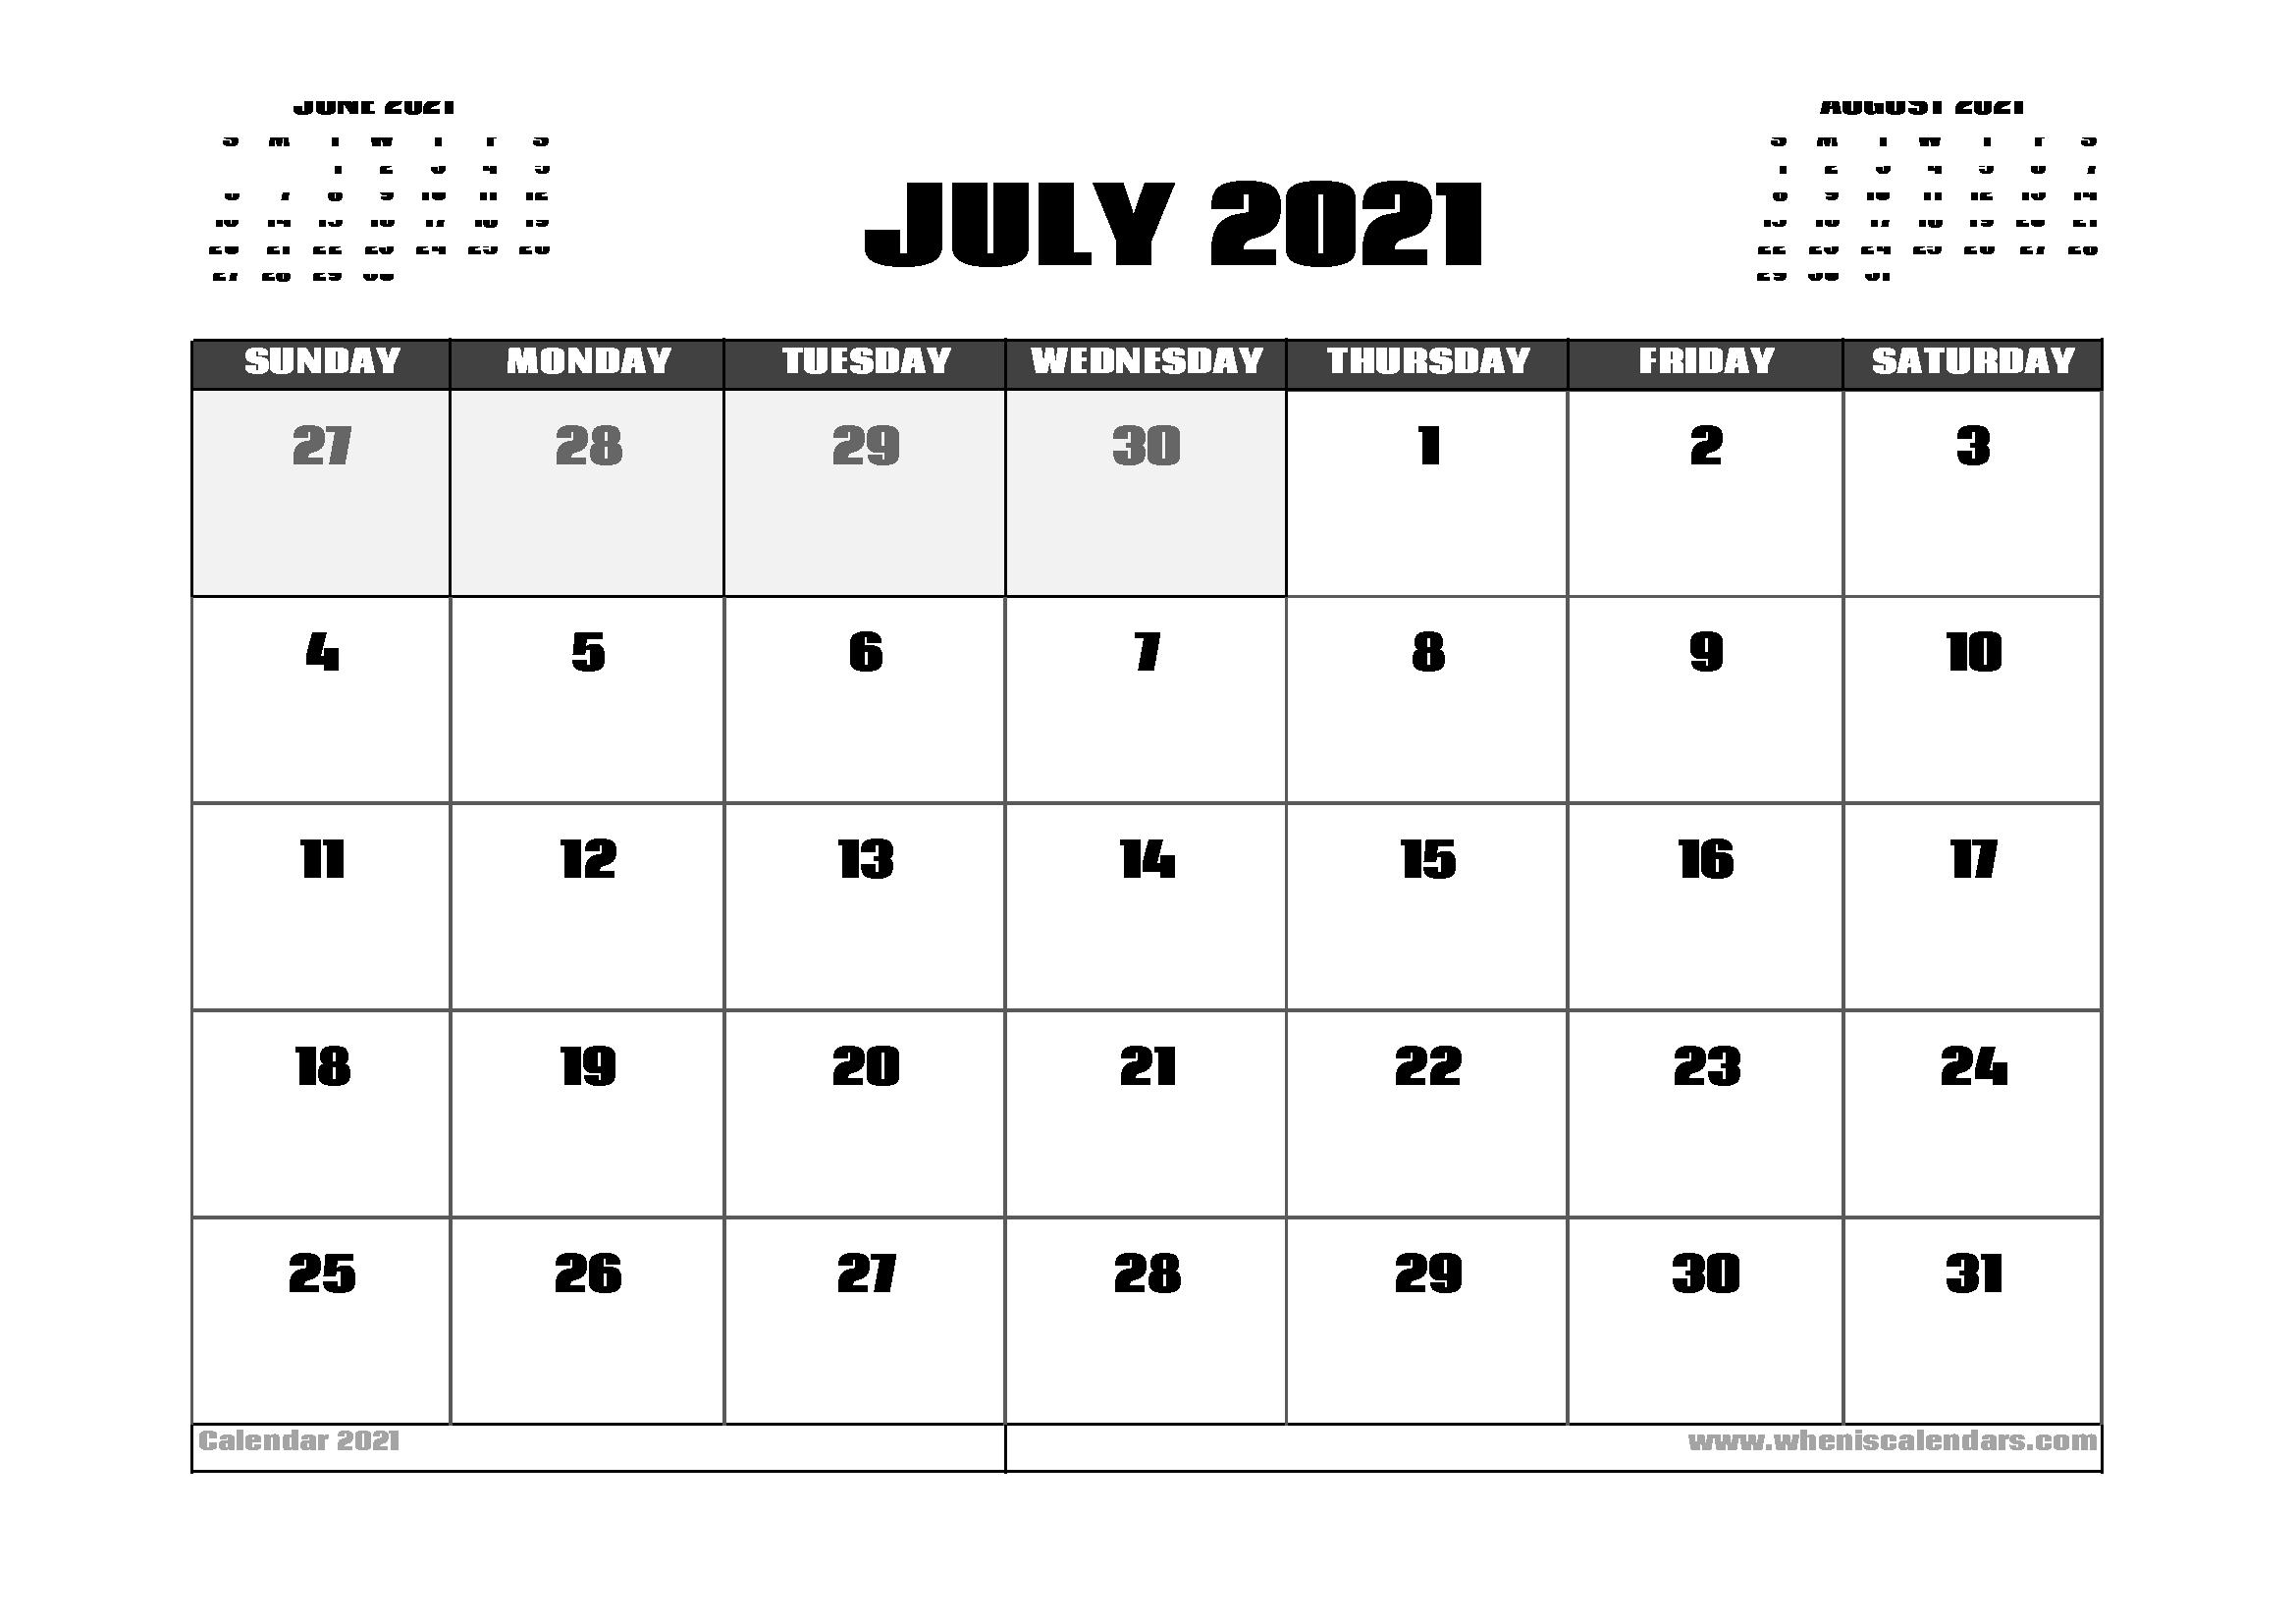 July 2021 Calendar Australia with Holidays